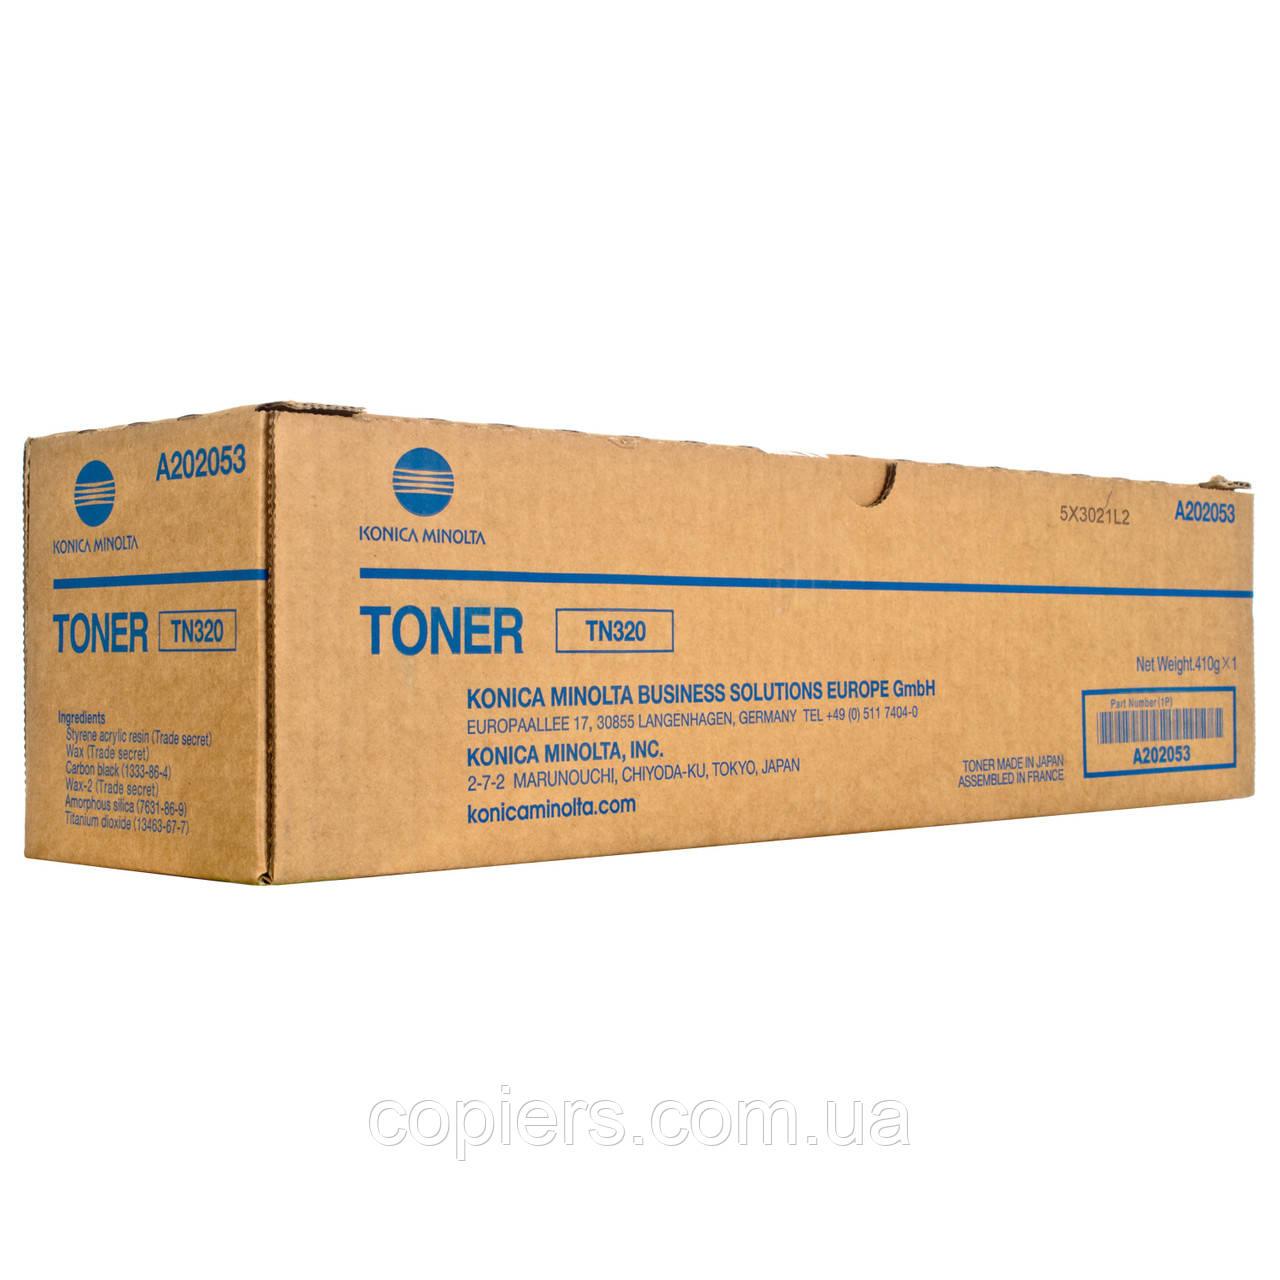 Тонер картридж TN320 Konica Minolta Bizhub 36, оригинал